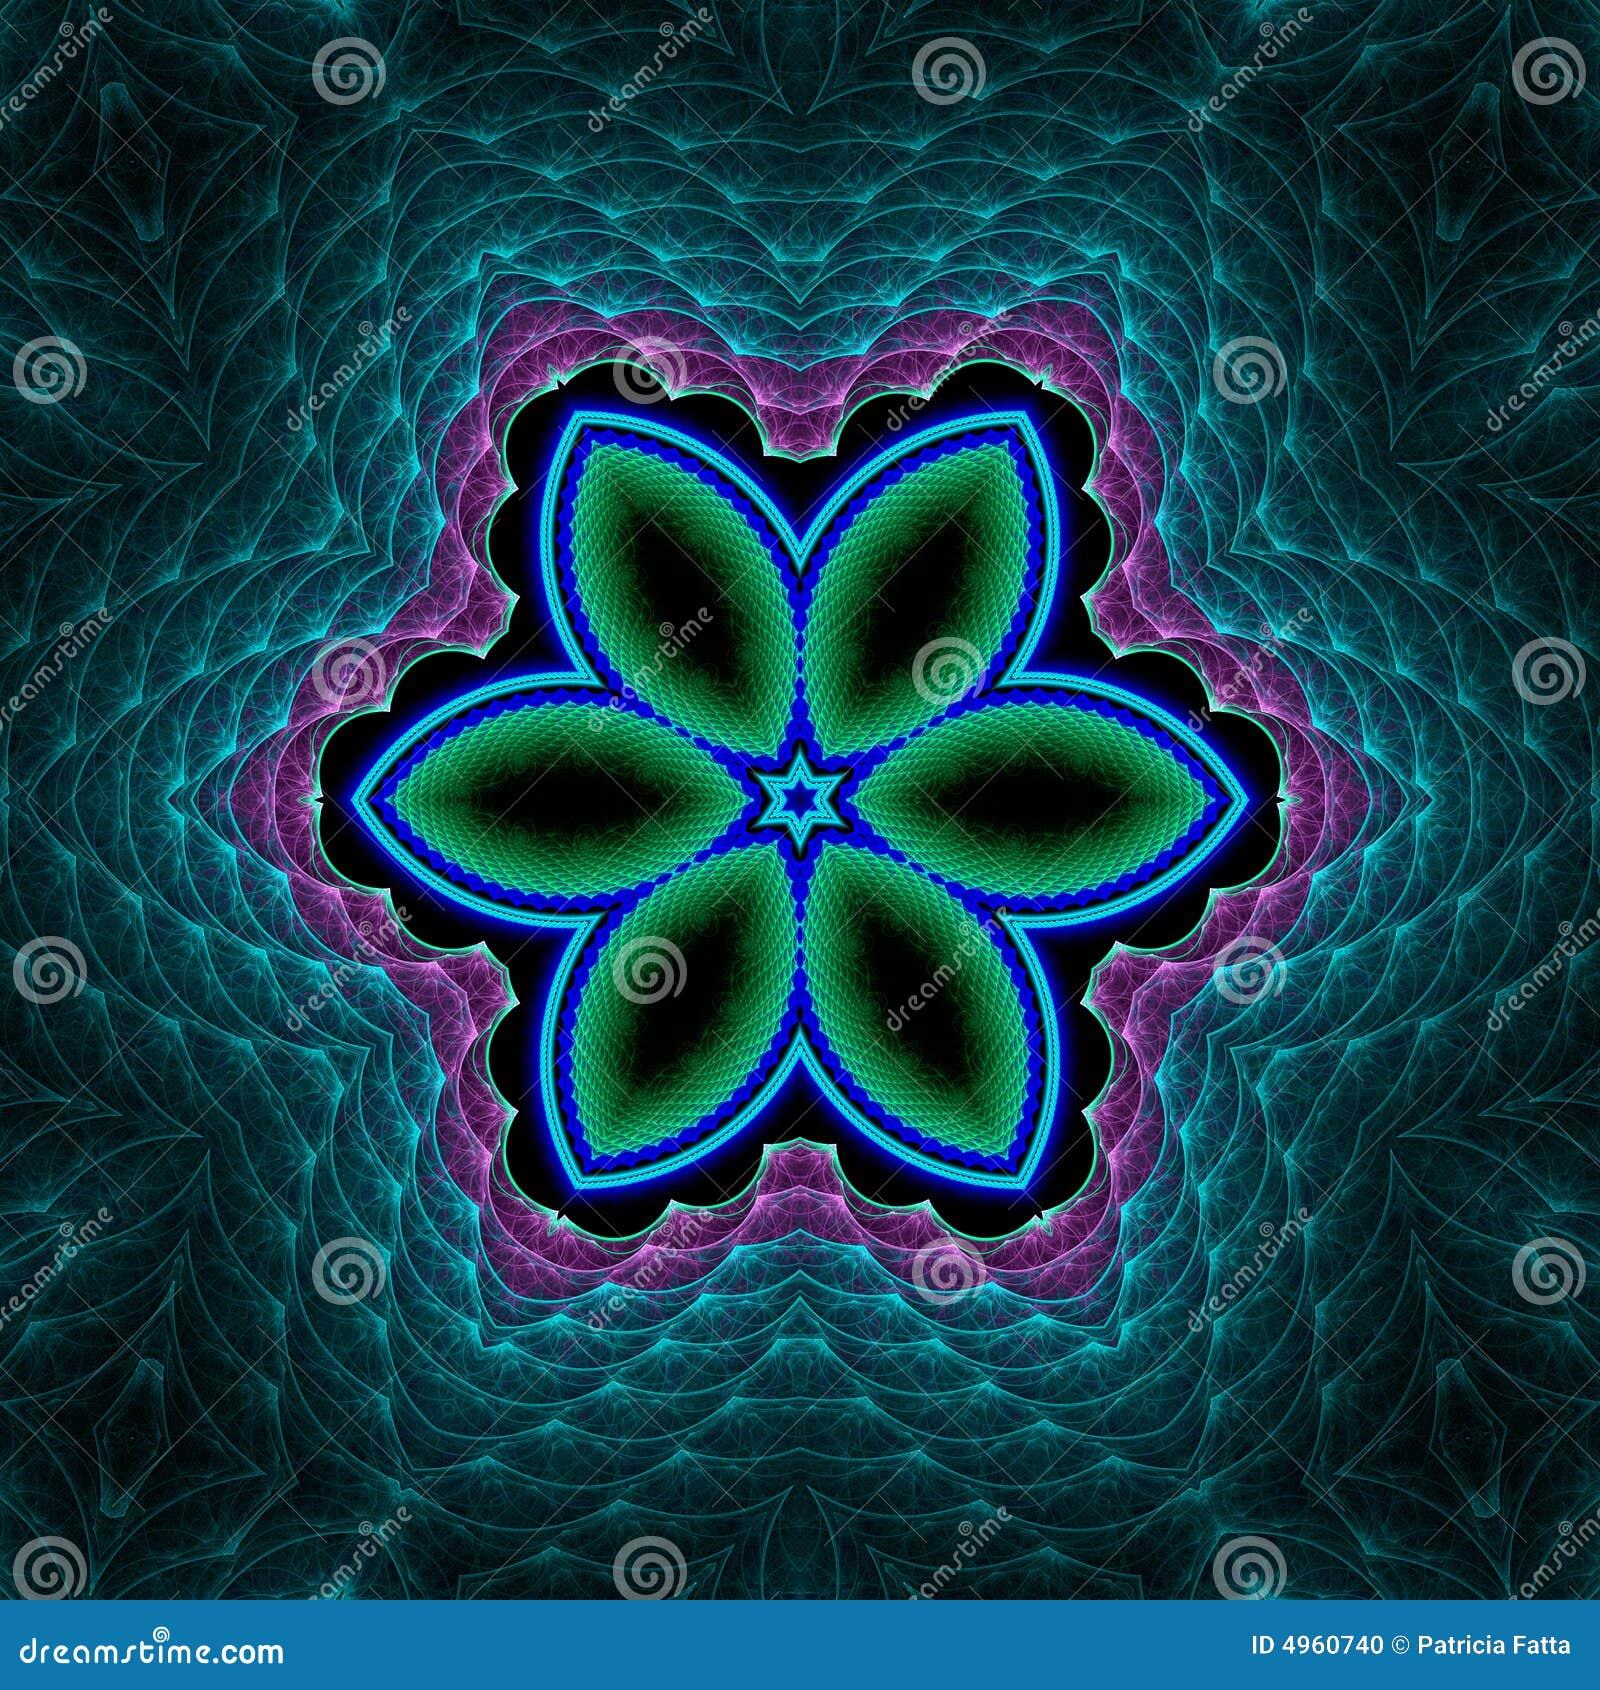 Floral mesh star quilt